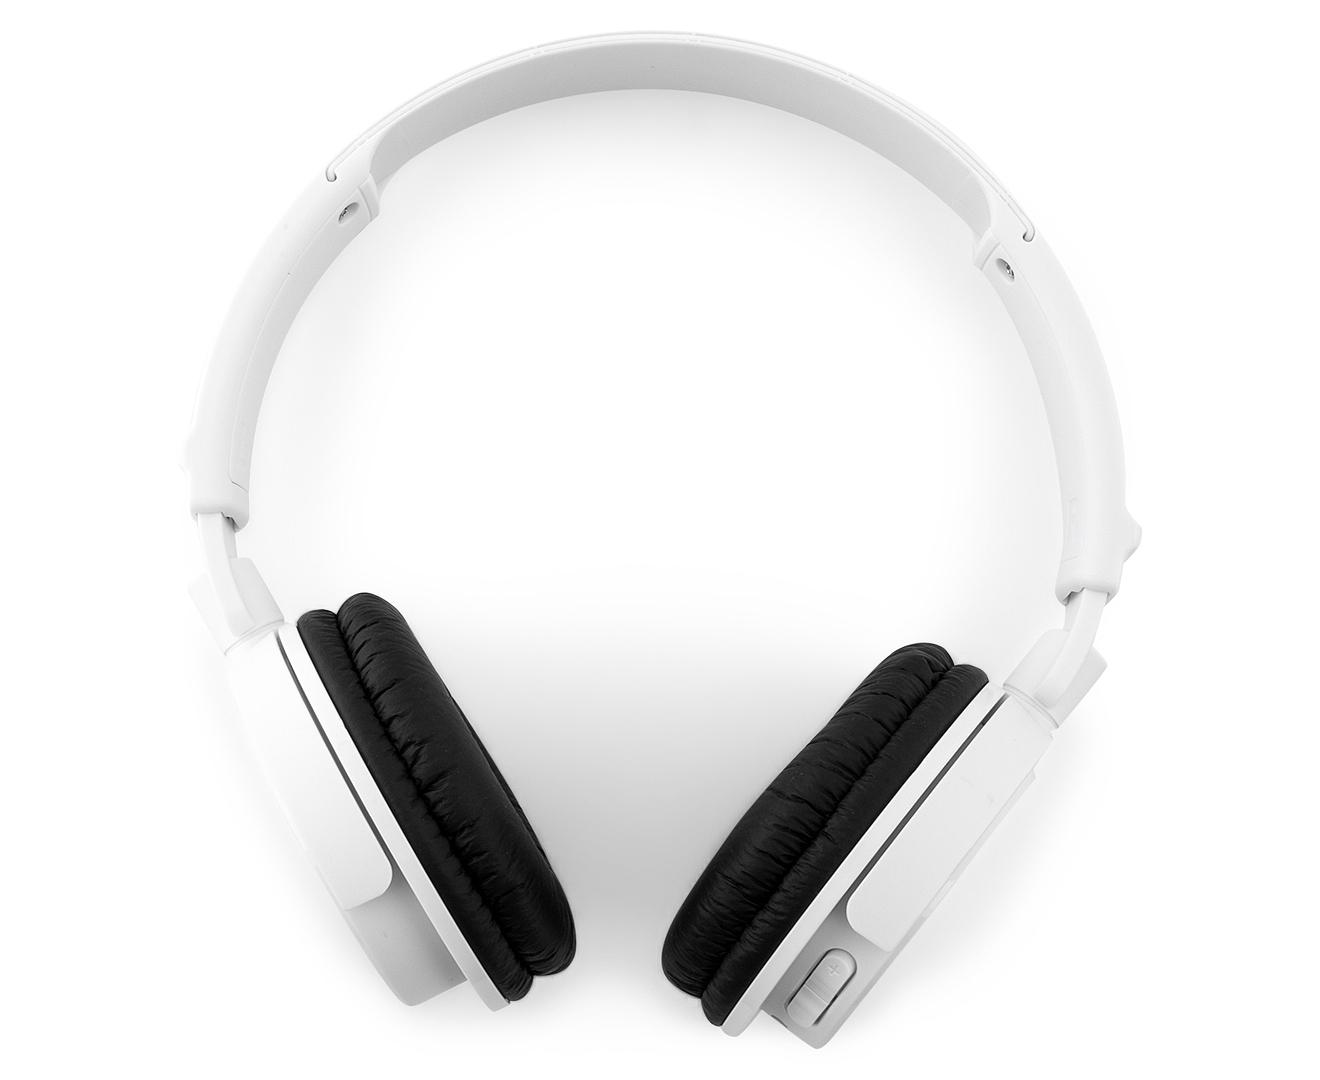 Wireless headphones bass noise cancelling - philips headphones wireless noise cancelling